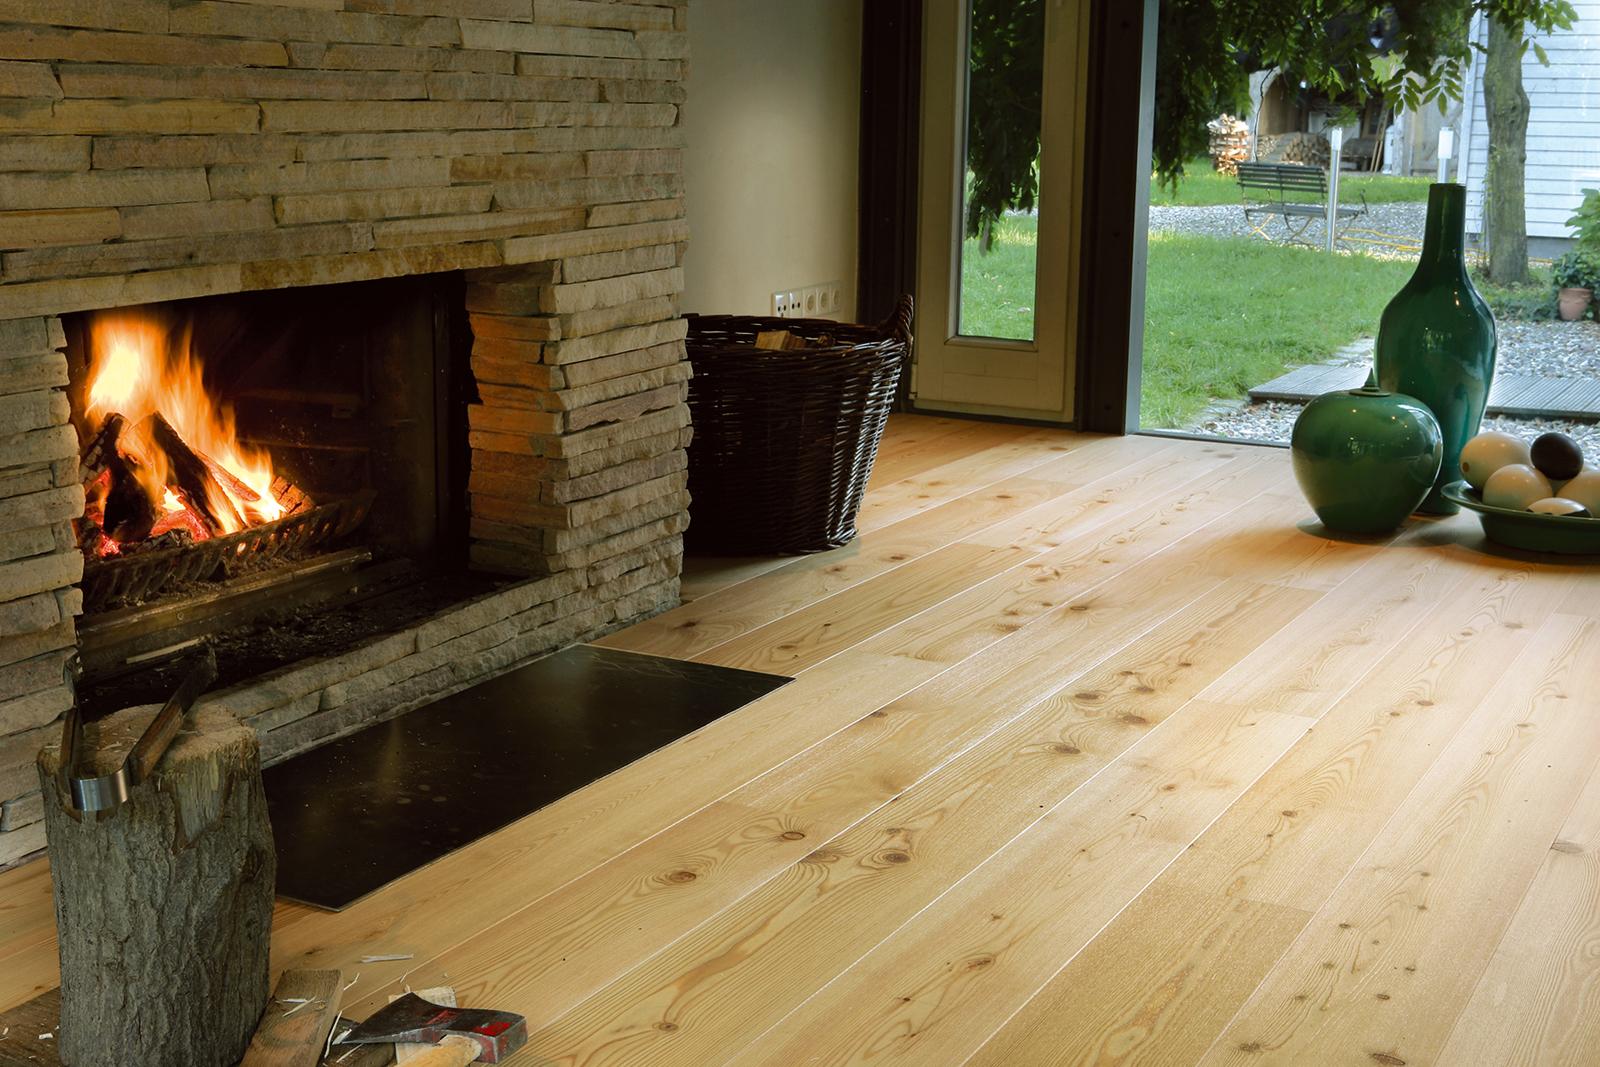 526110 haro parkett landhausdiele 4000 l rche markant. Black Bedroom Furniture Sets. Home Design Ideas